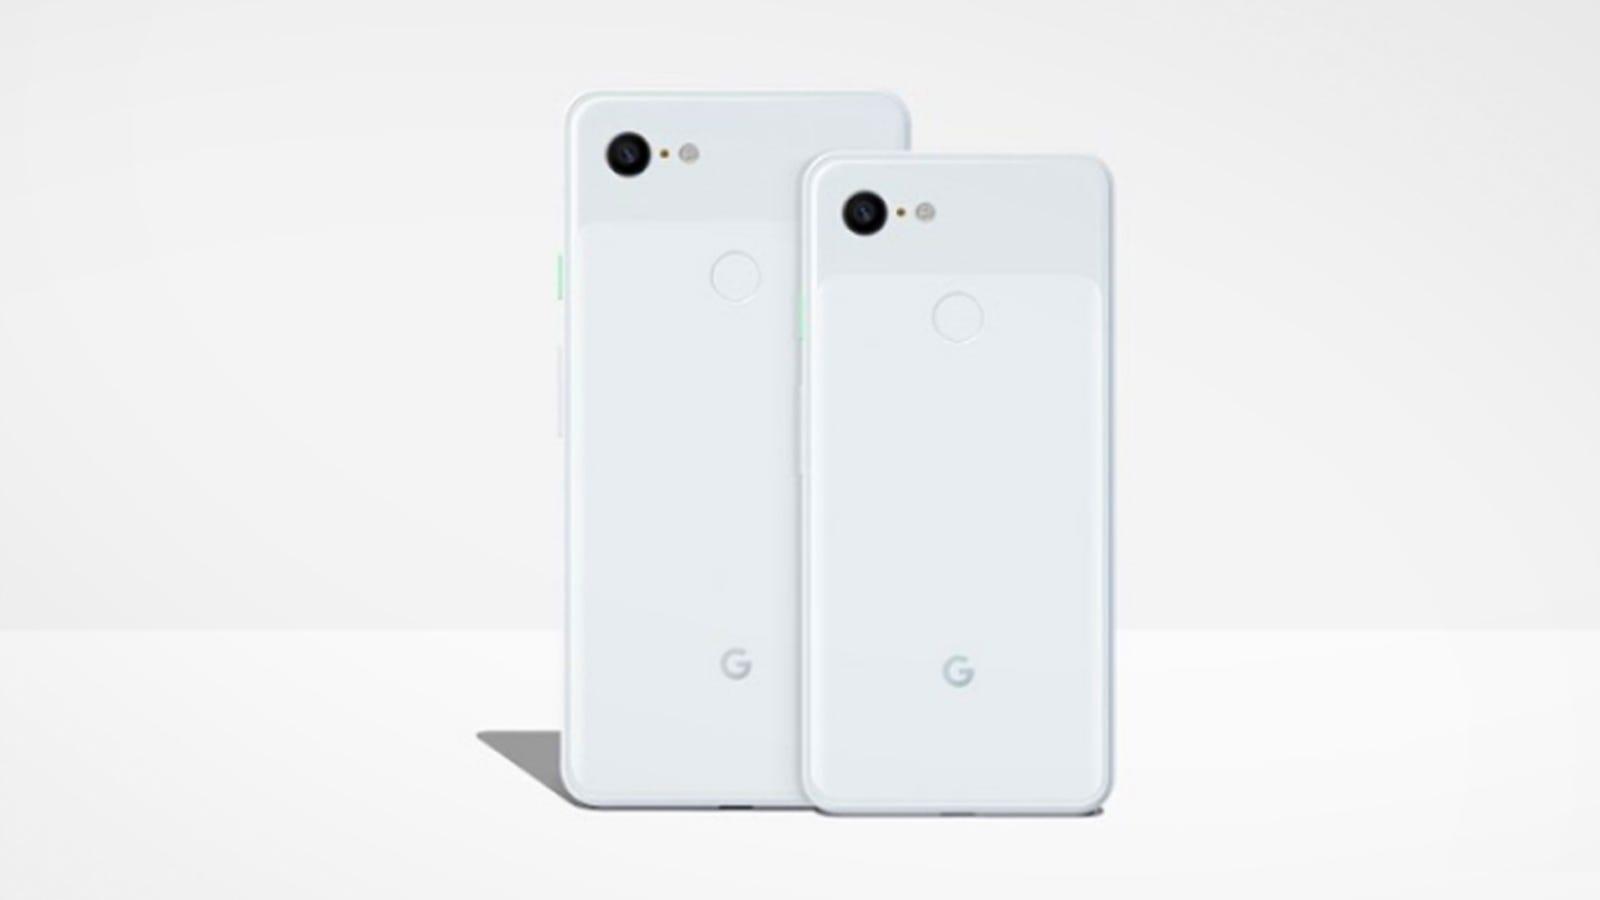 Save $300 on a Pixel 3 or Pixel 3 XL Through September 28